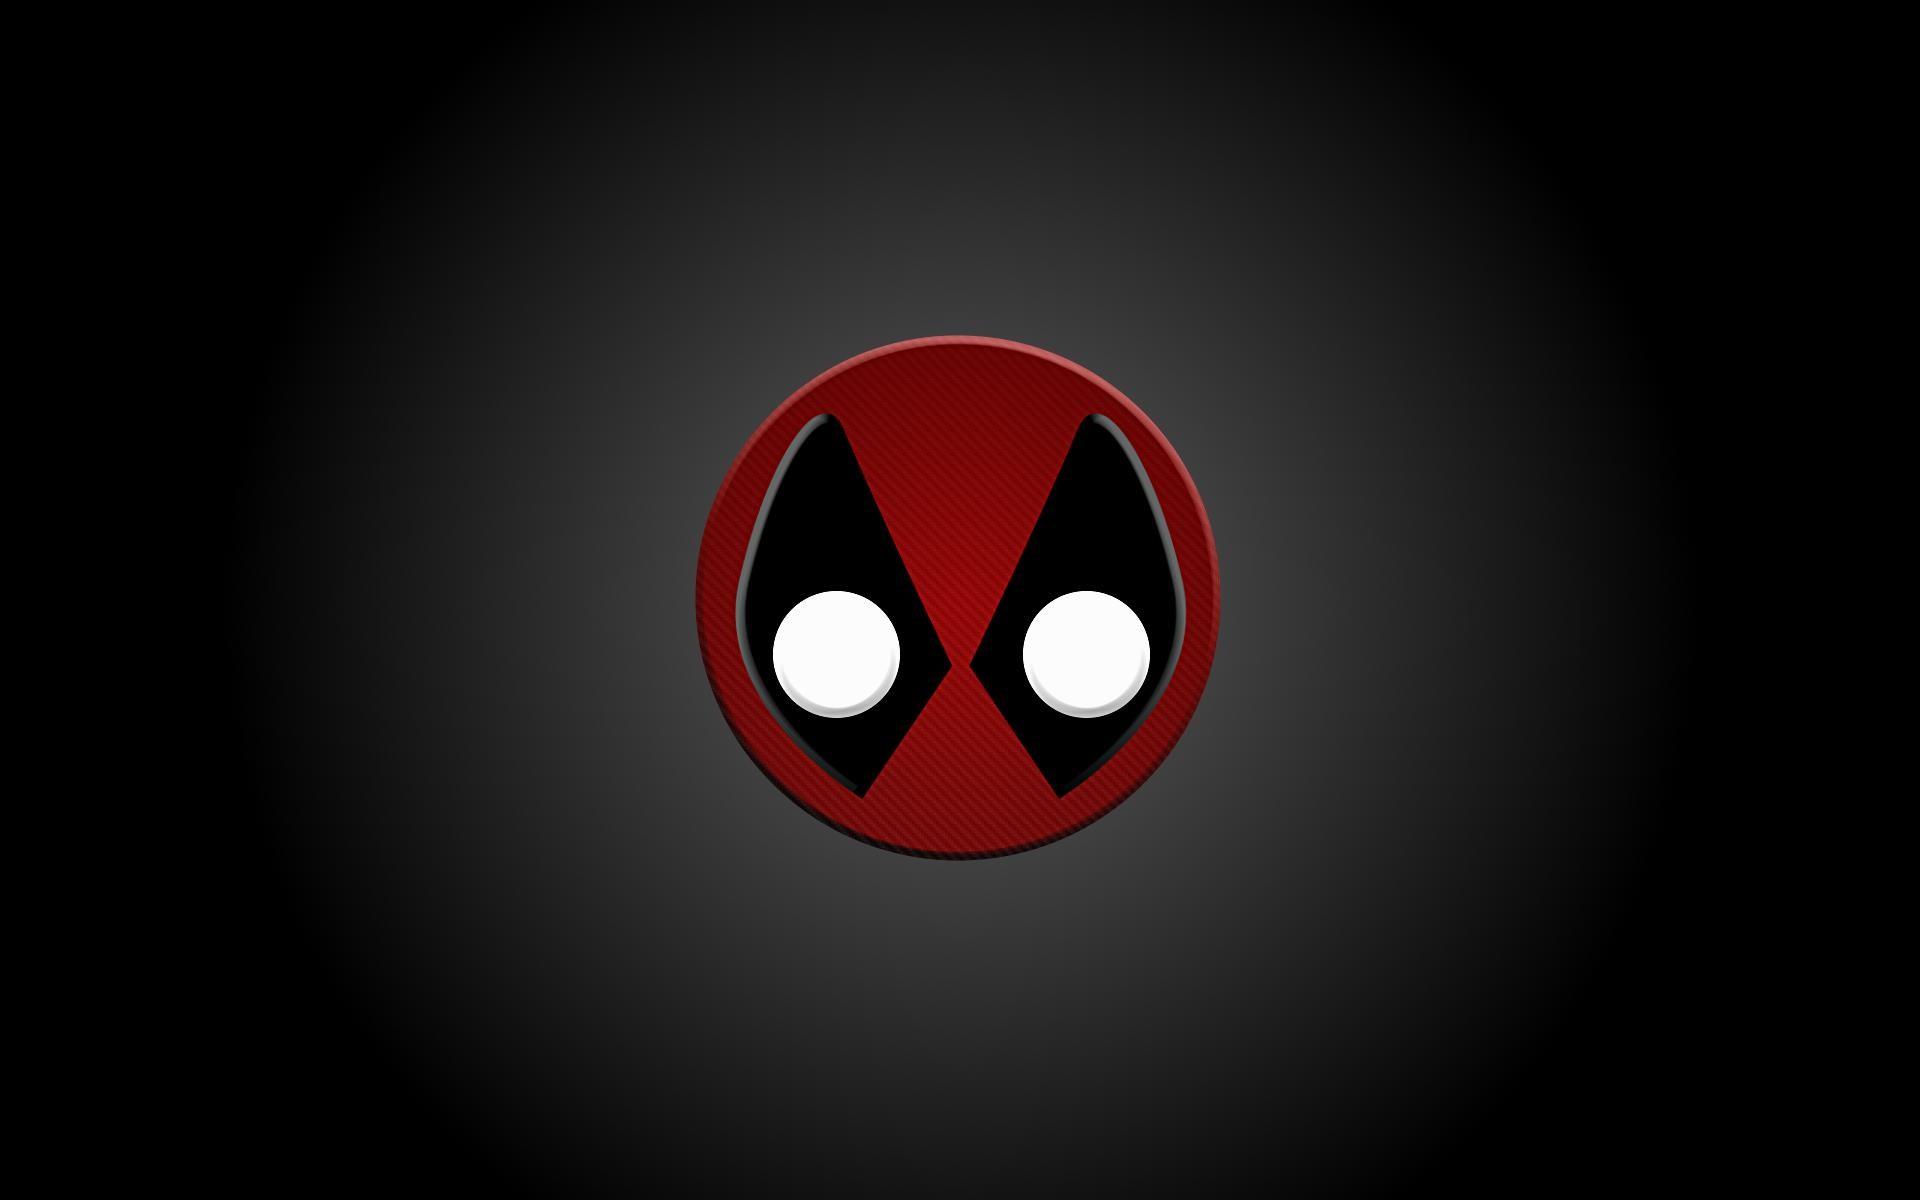 Deadpool-3D-Logo-Wallpaper-HD